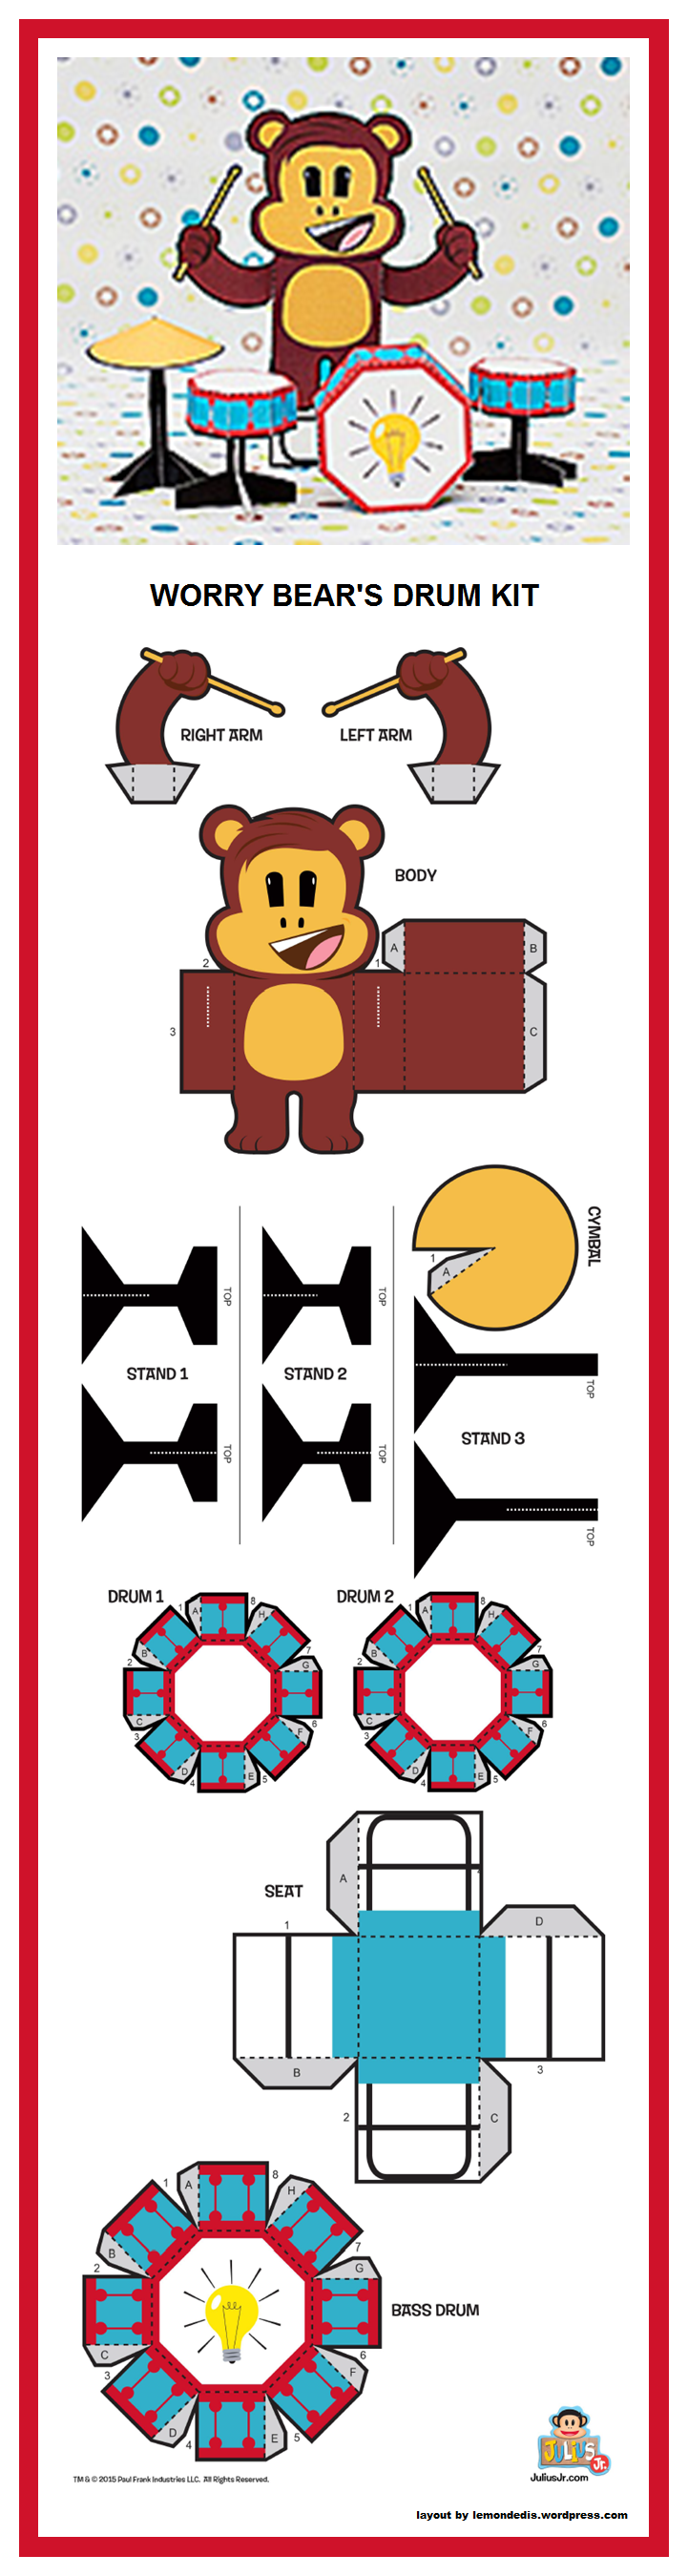 Drum Kits Paper Toys Box Bag Gift Boxes Papercraft Jr Filing Templates Cute Pets